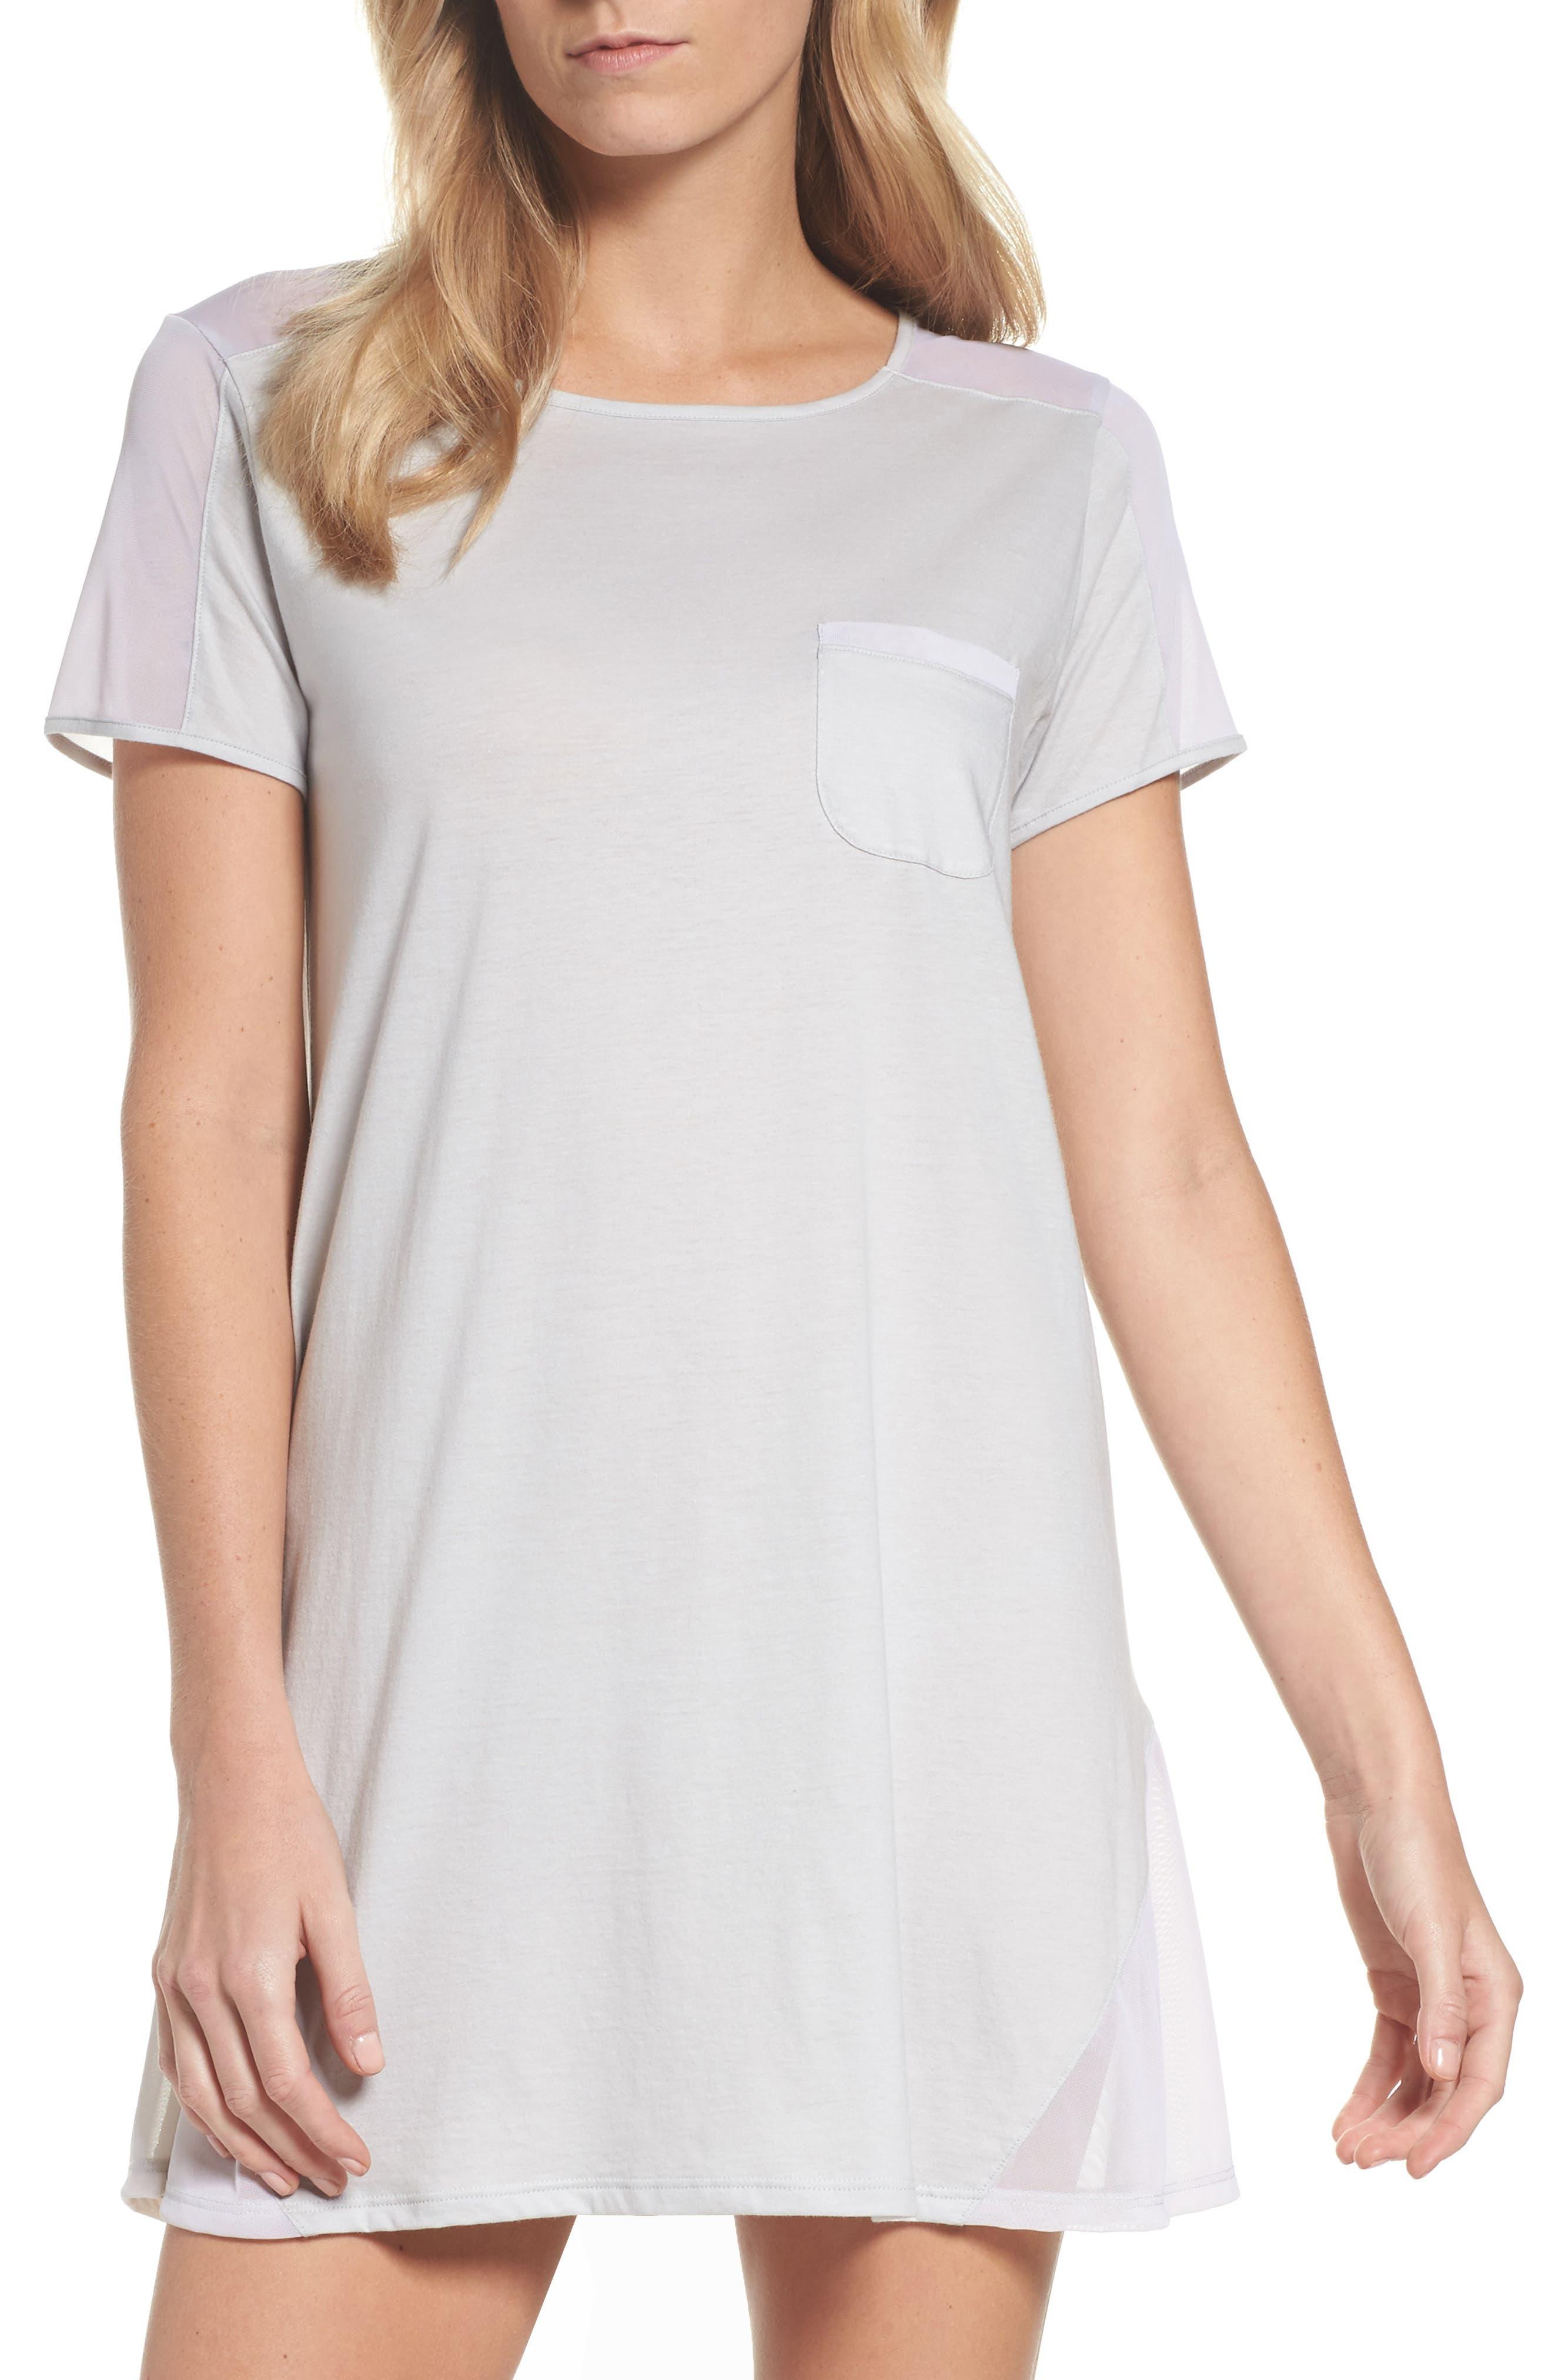 Naked Cotton Sleep Shirt, Grey